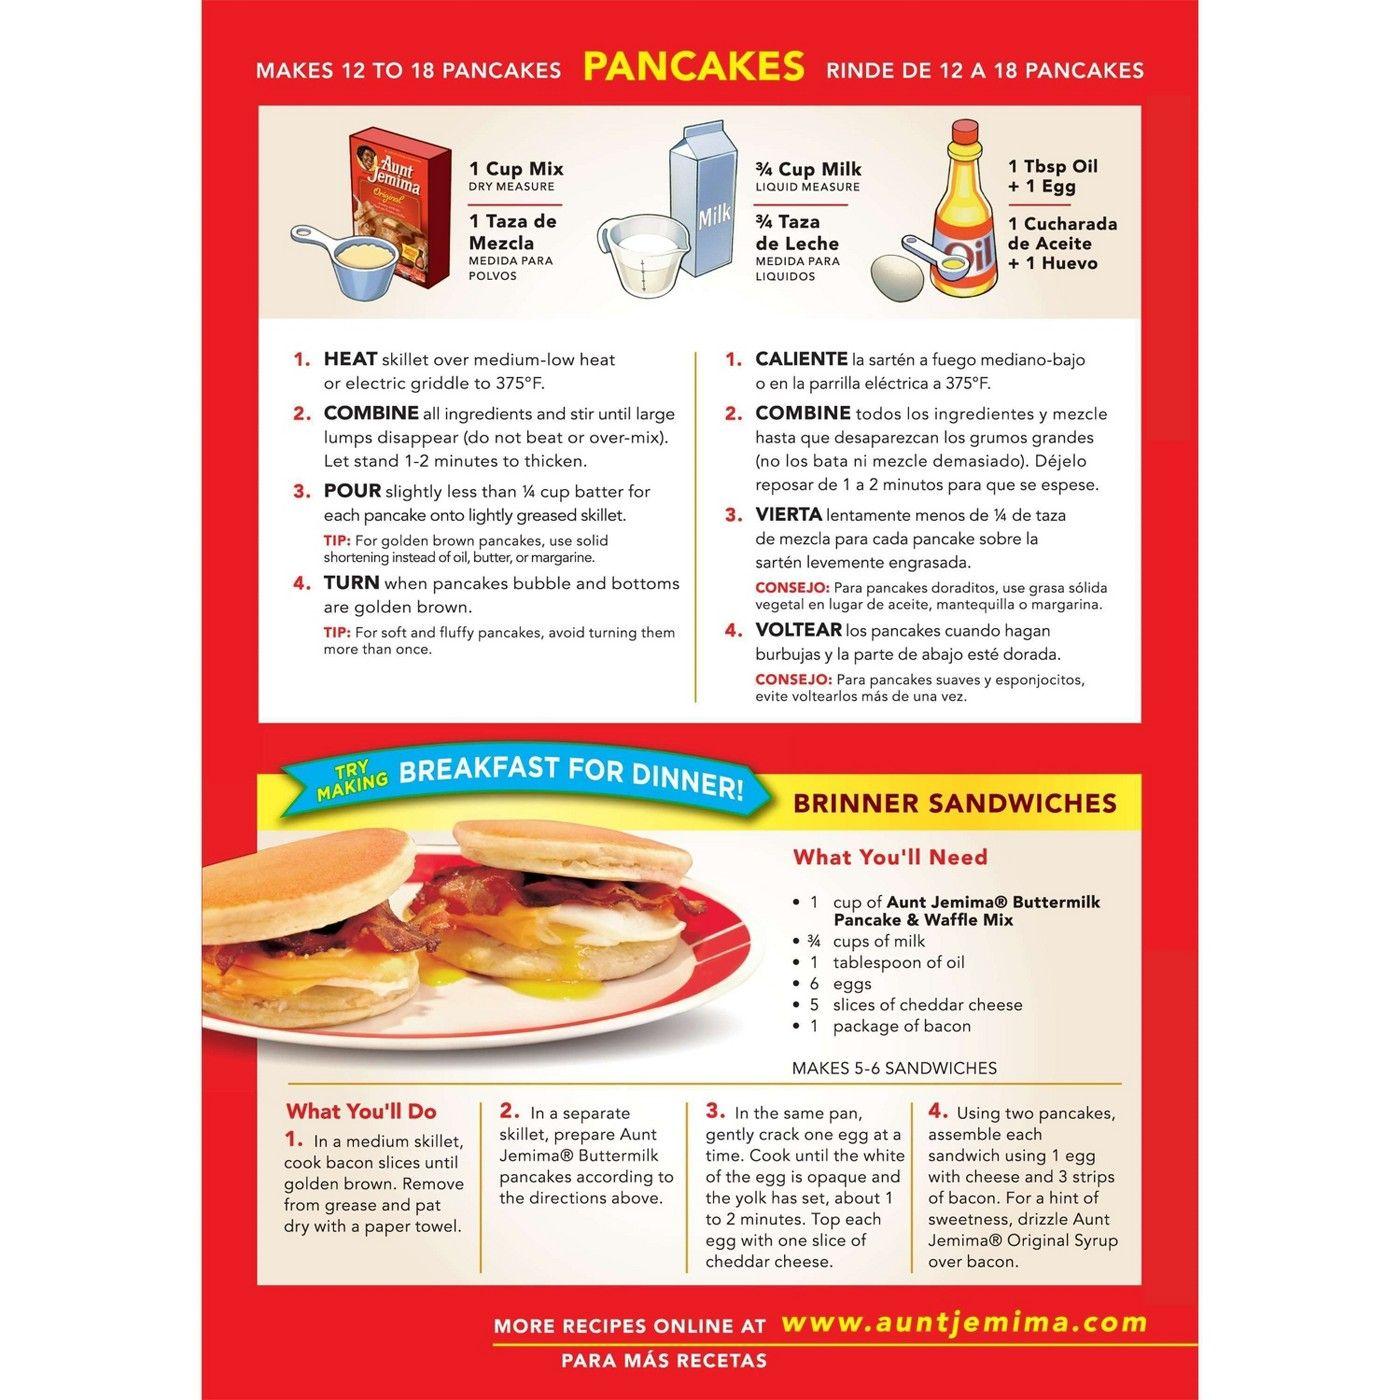 Aunt Jemima Buttermilk Pancake Mix 32 Oz In 2020 Buttermilk Pancake Mix Aunt Jemima Pancake Mix Aunt Jemima Pancake Mix Recipe